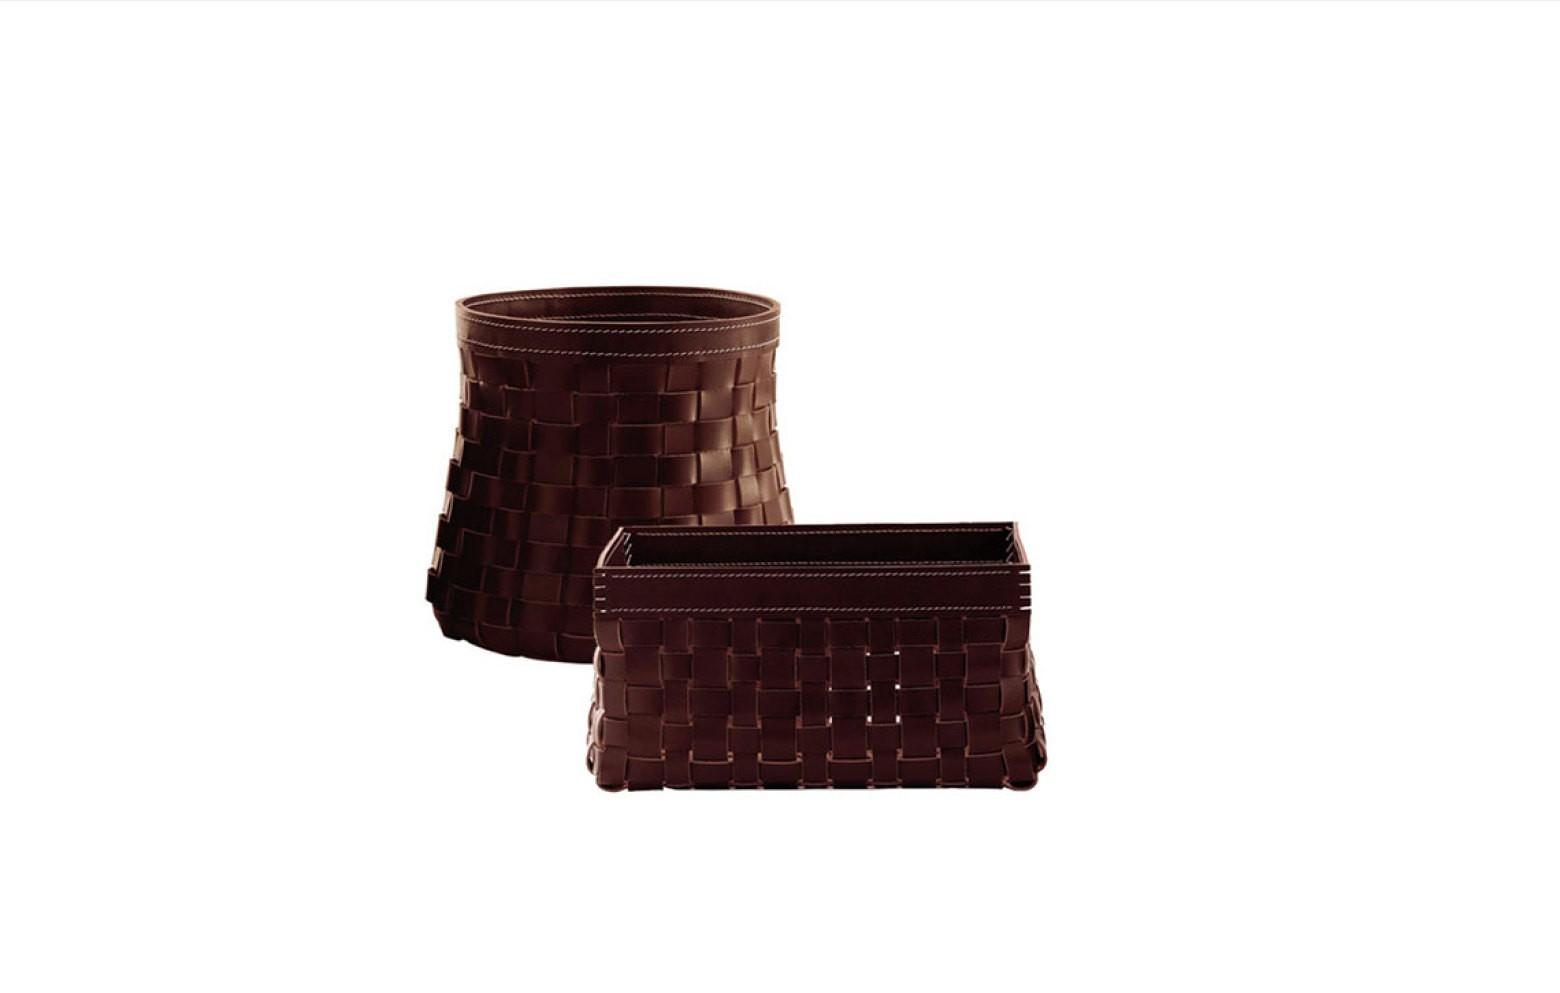 intrecci accessoires kleinm bel accessoires who 39 s. Black Bedroom Furniture Sets. Home Design Ideas